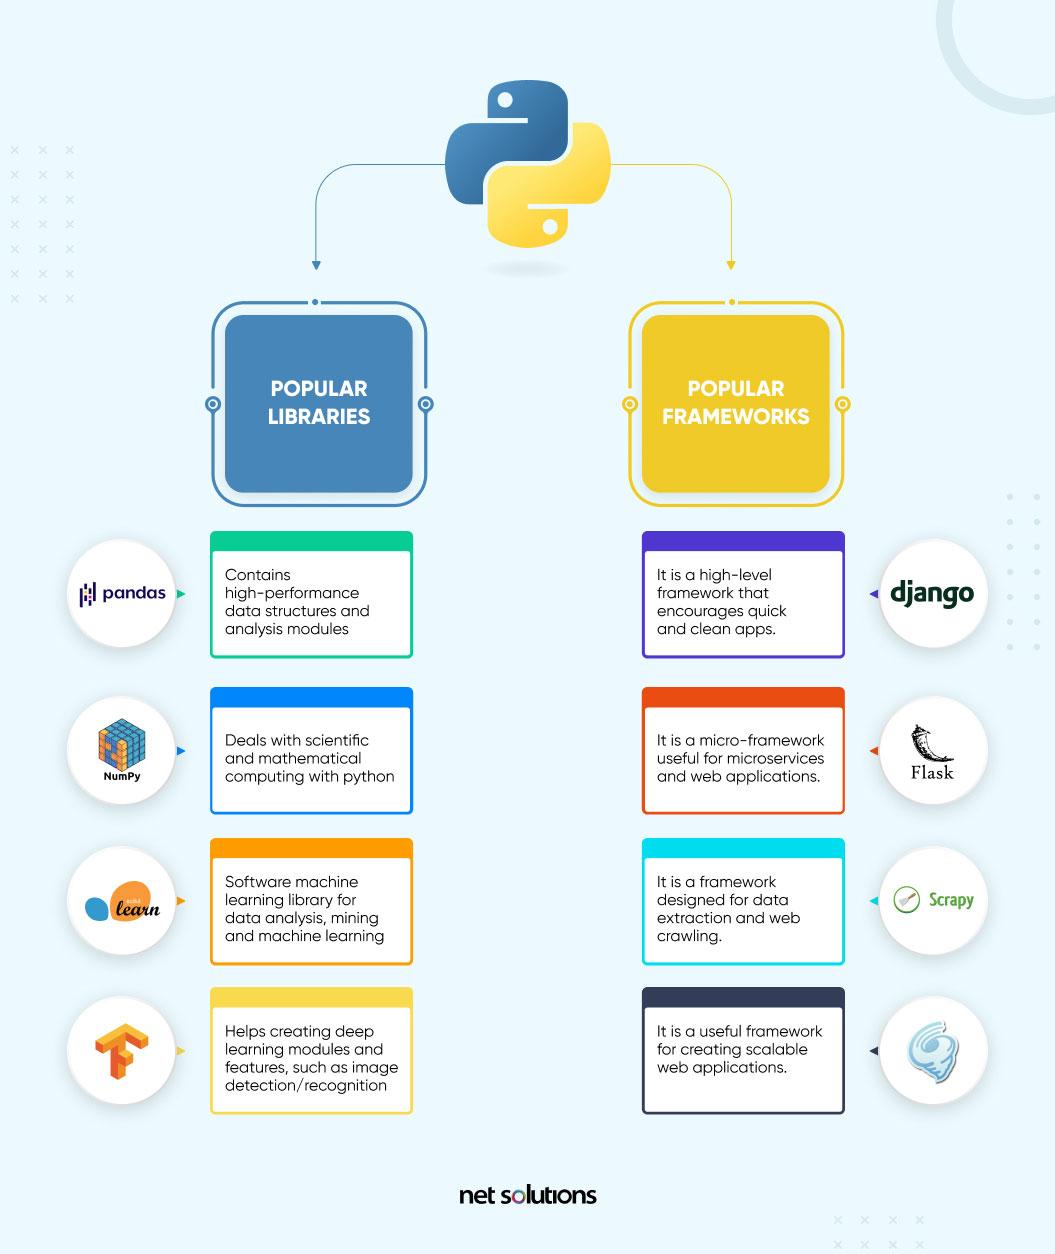 popular python libraries and frameworks